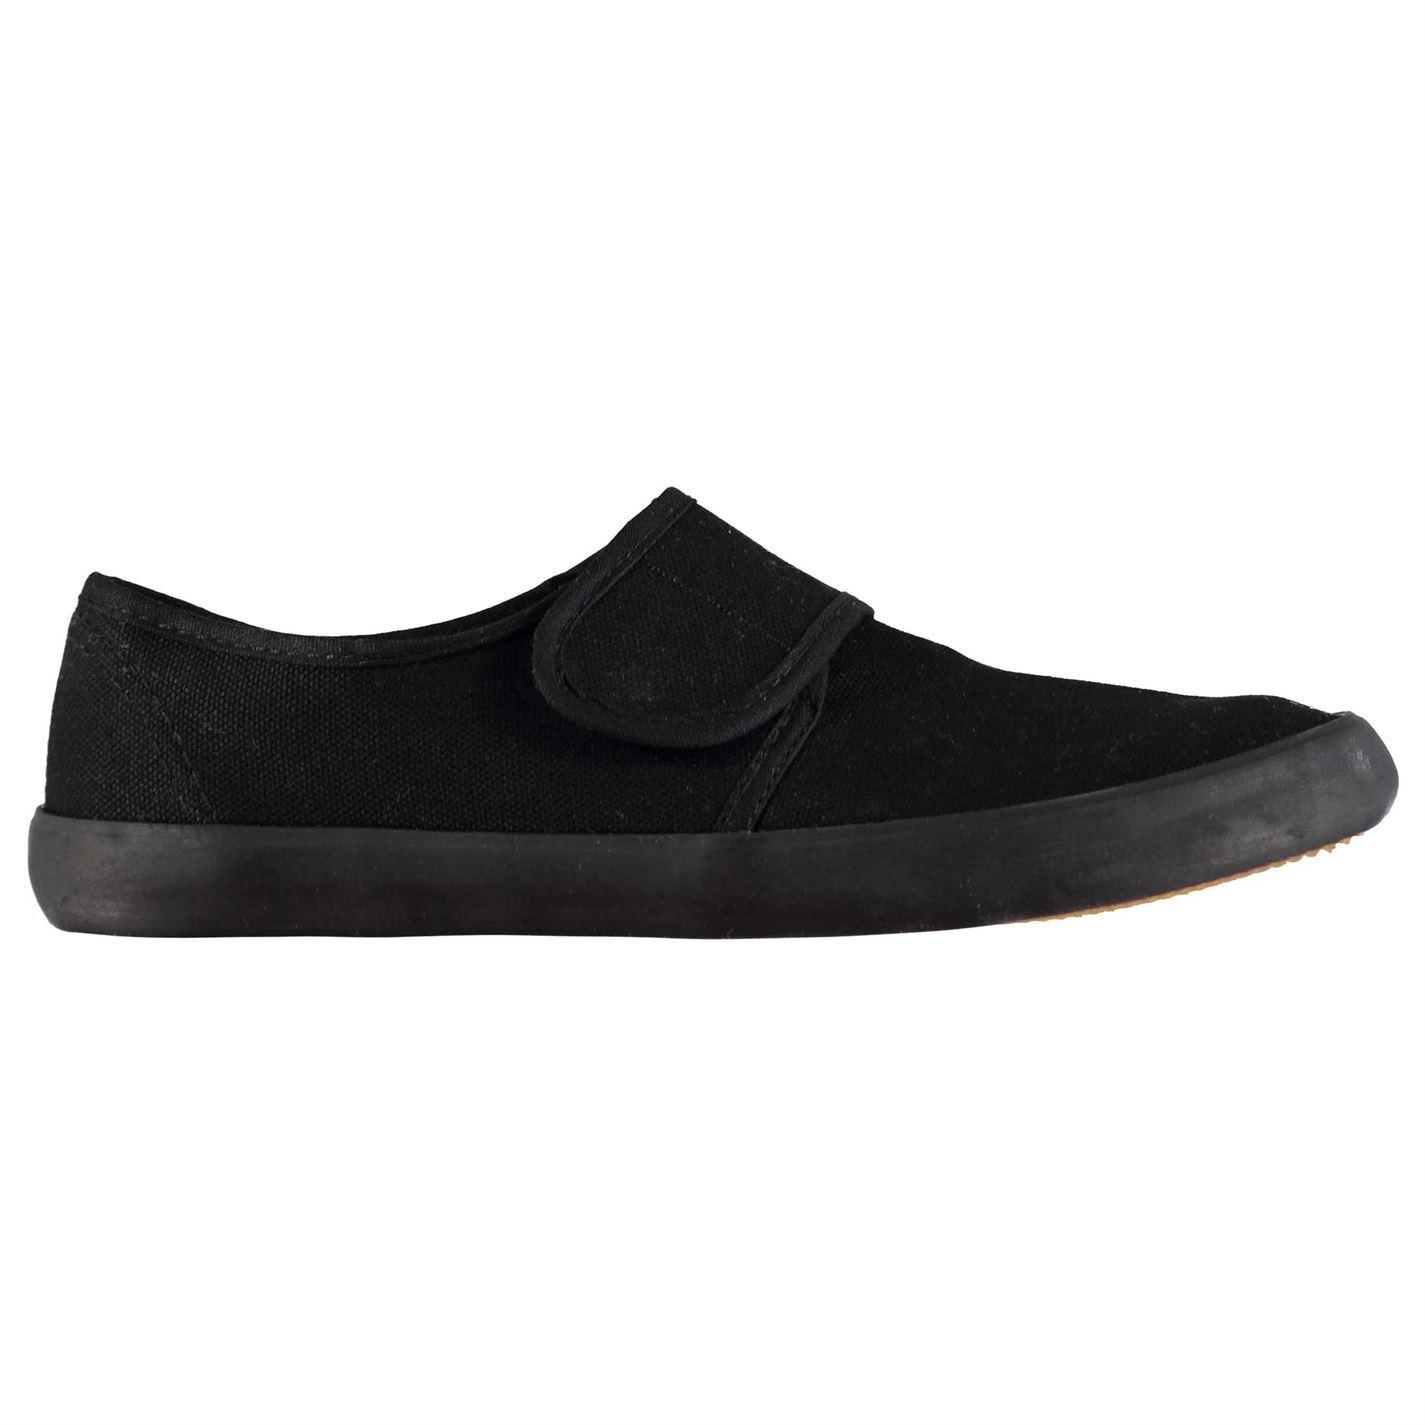 Slazenger BTS Girls Canvas Shoes Black